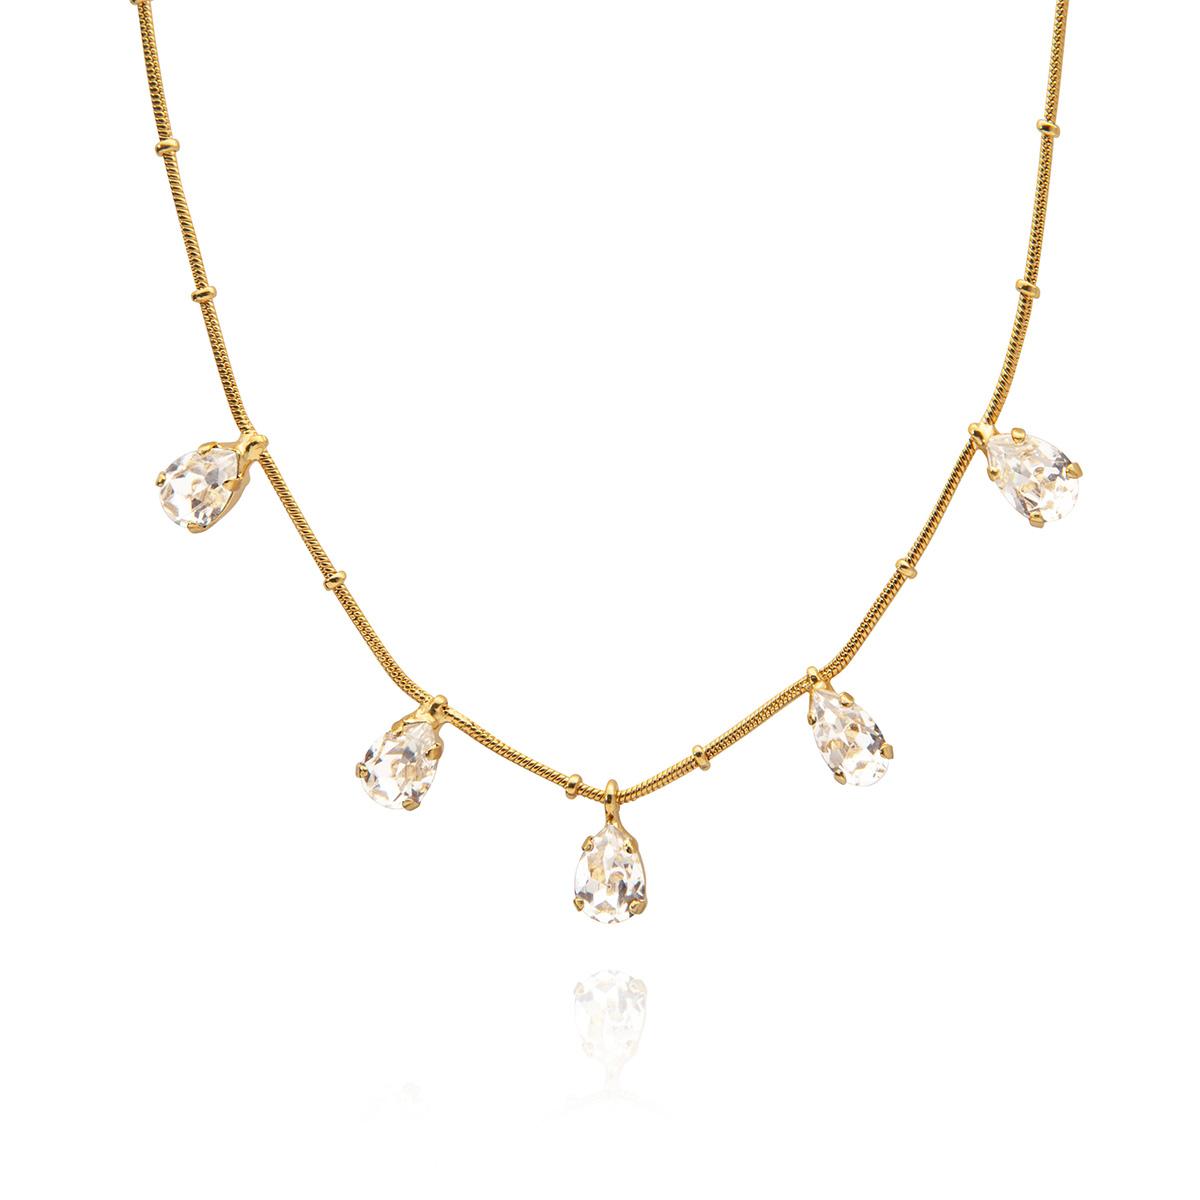 Caroline Svedbom - Estelle halsband, guld/crystal